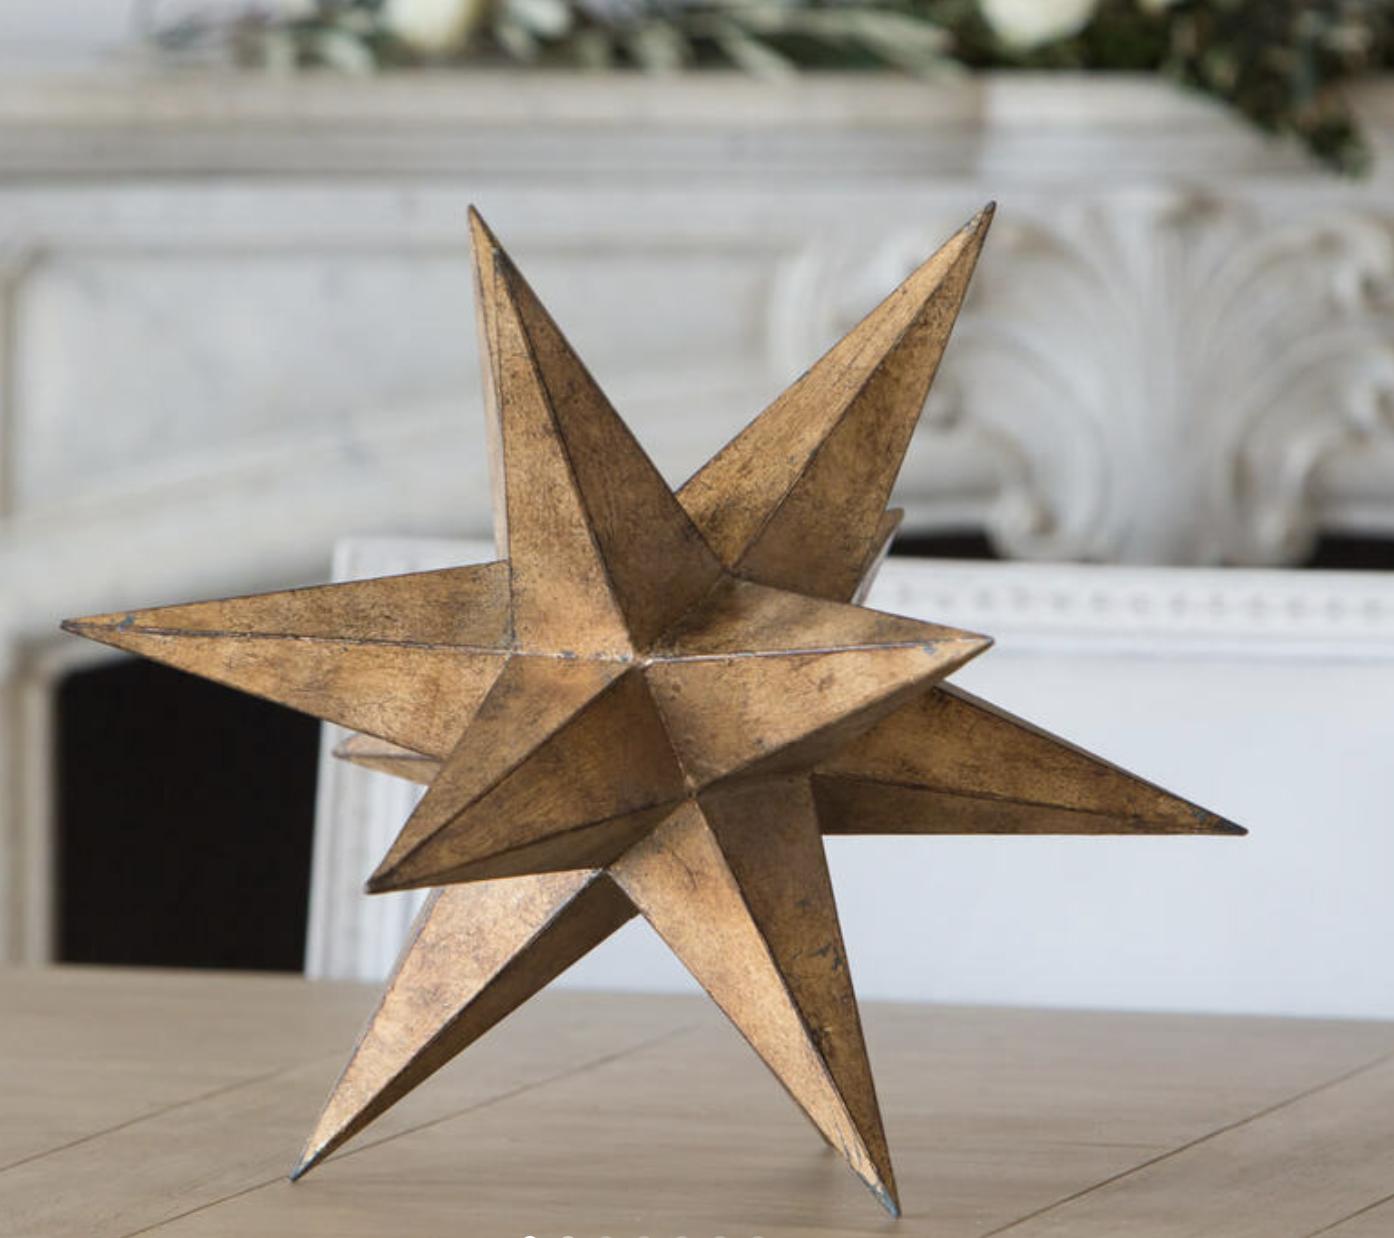 Decorative Stella in Old Worn Gold Finish